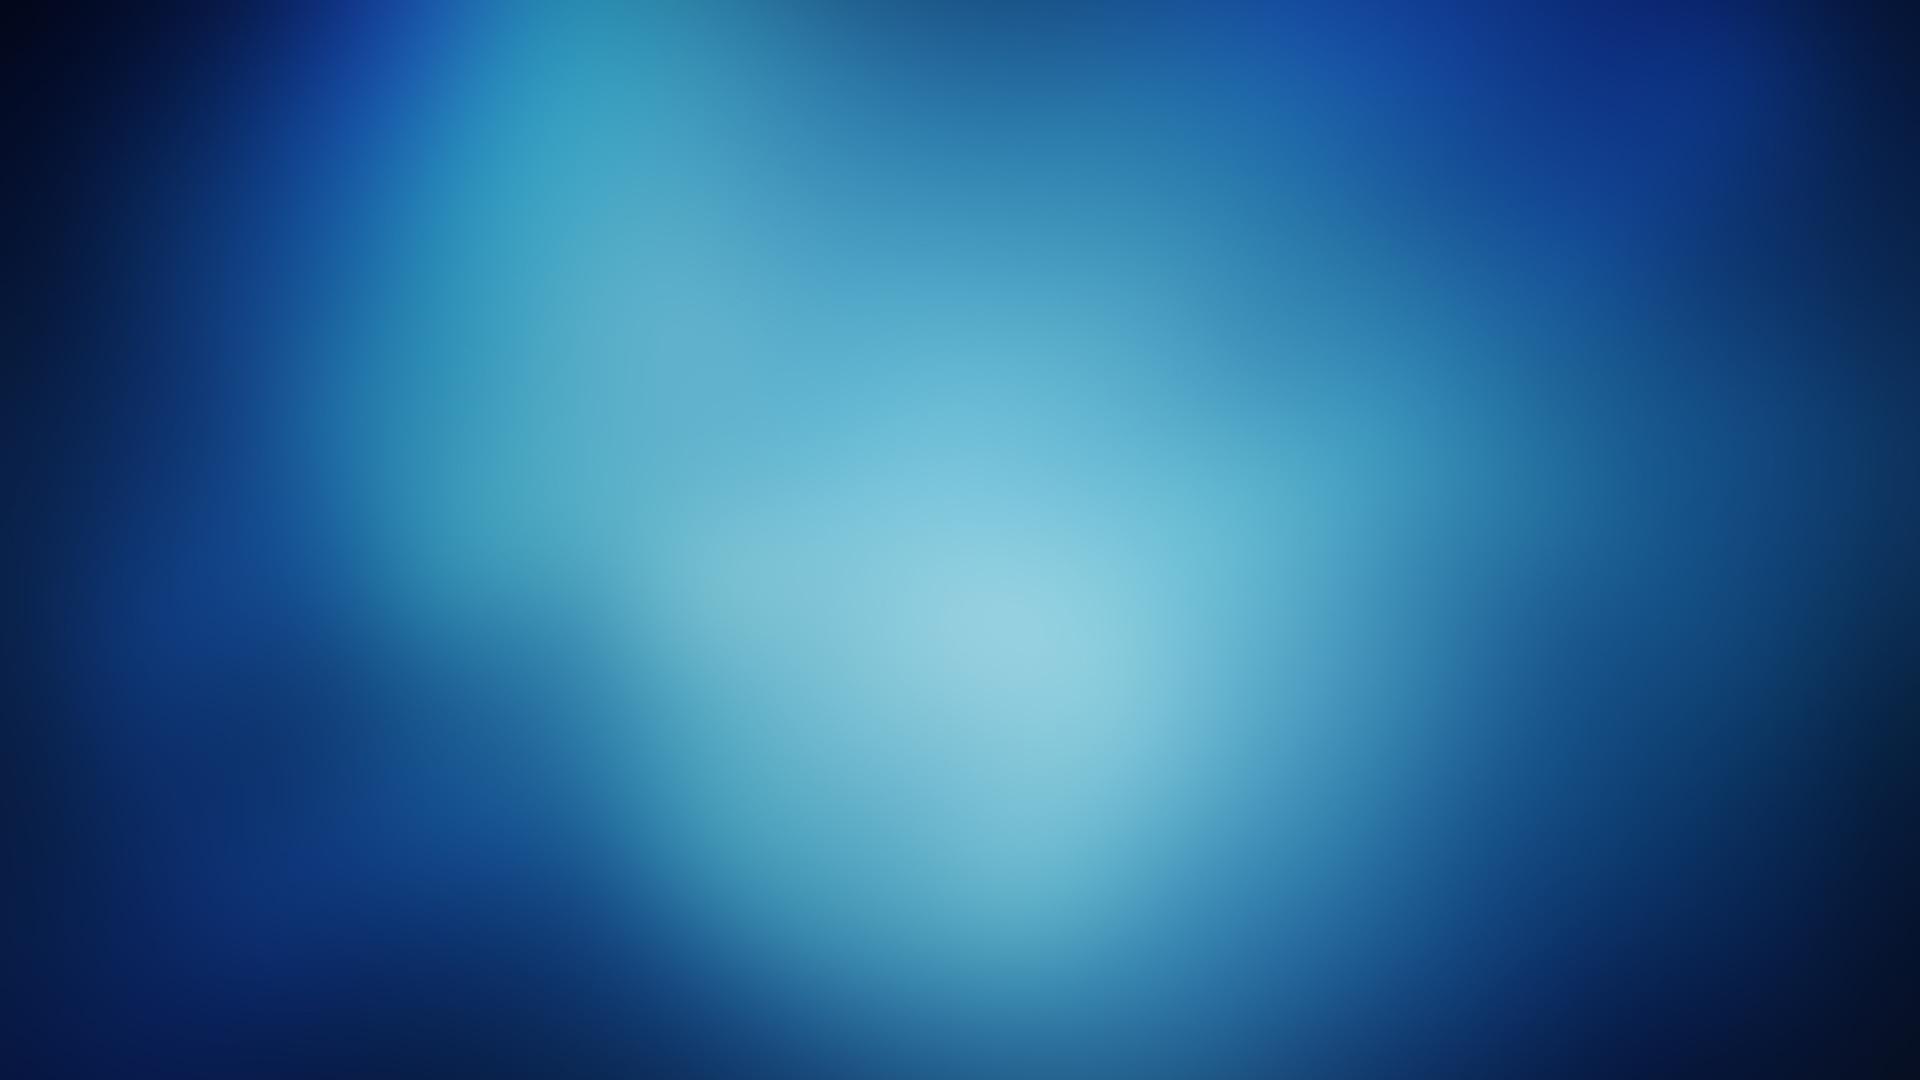 Free Blue Background